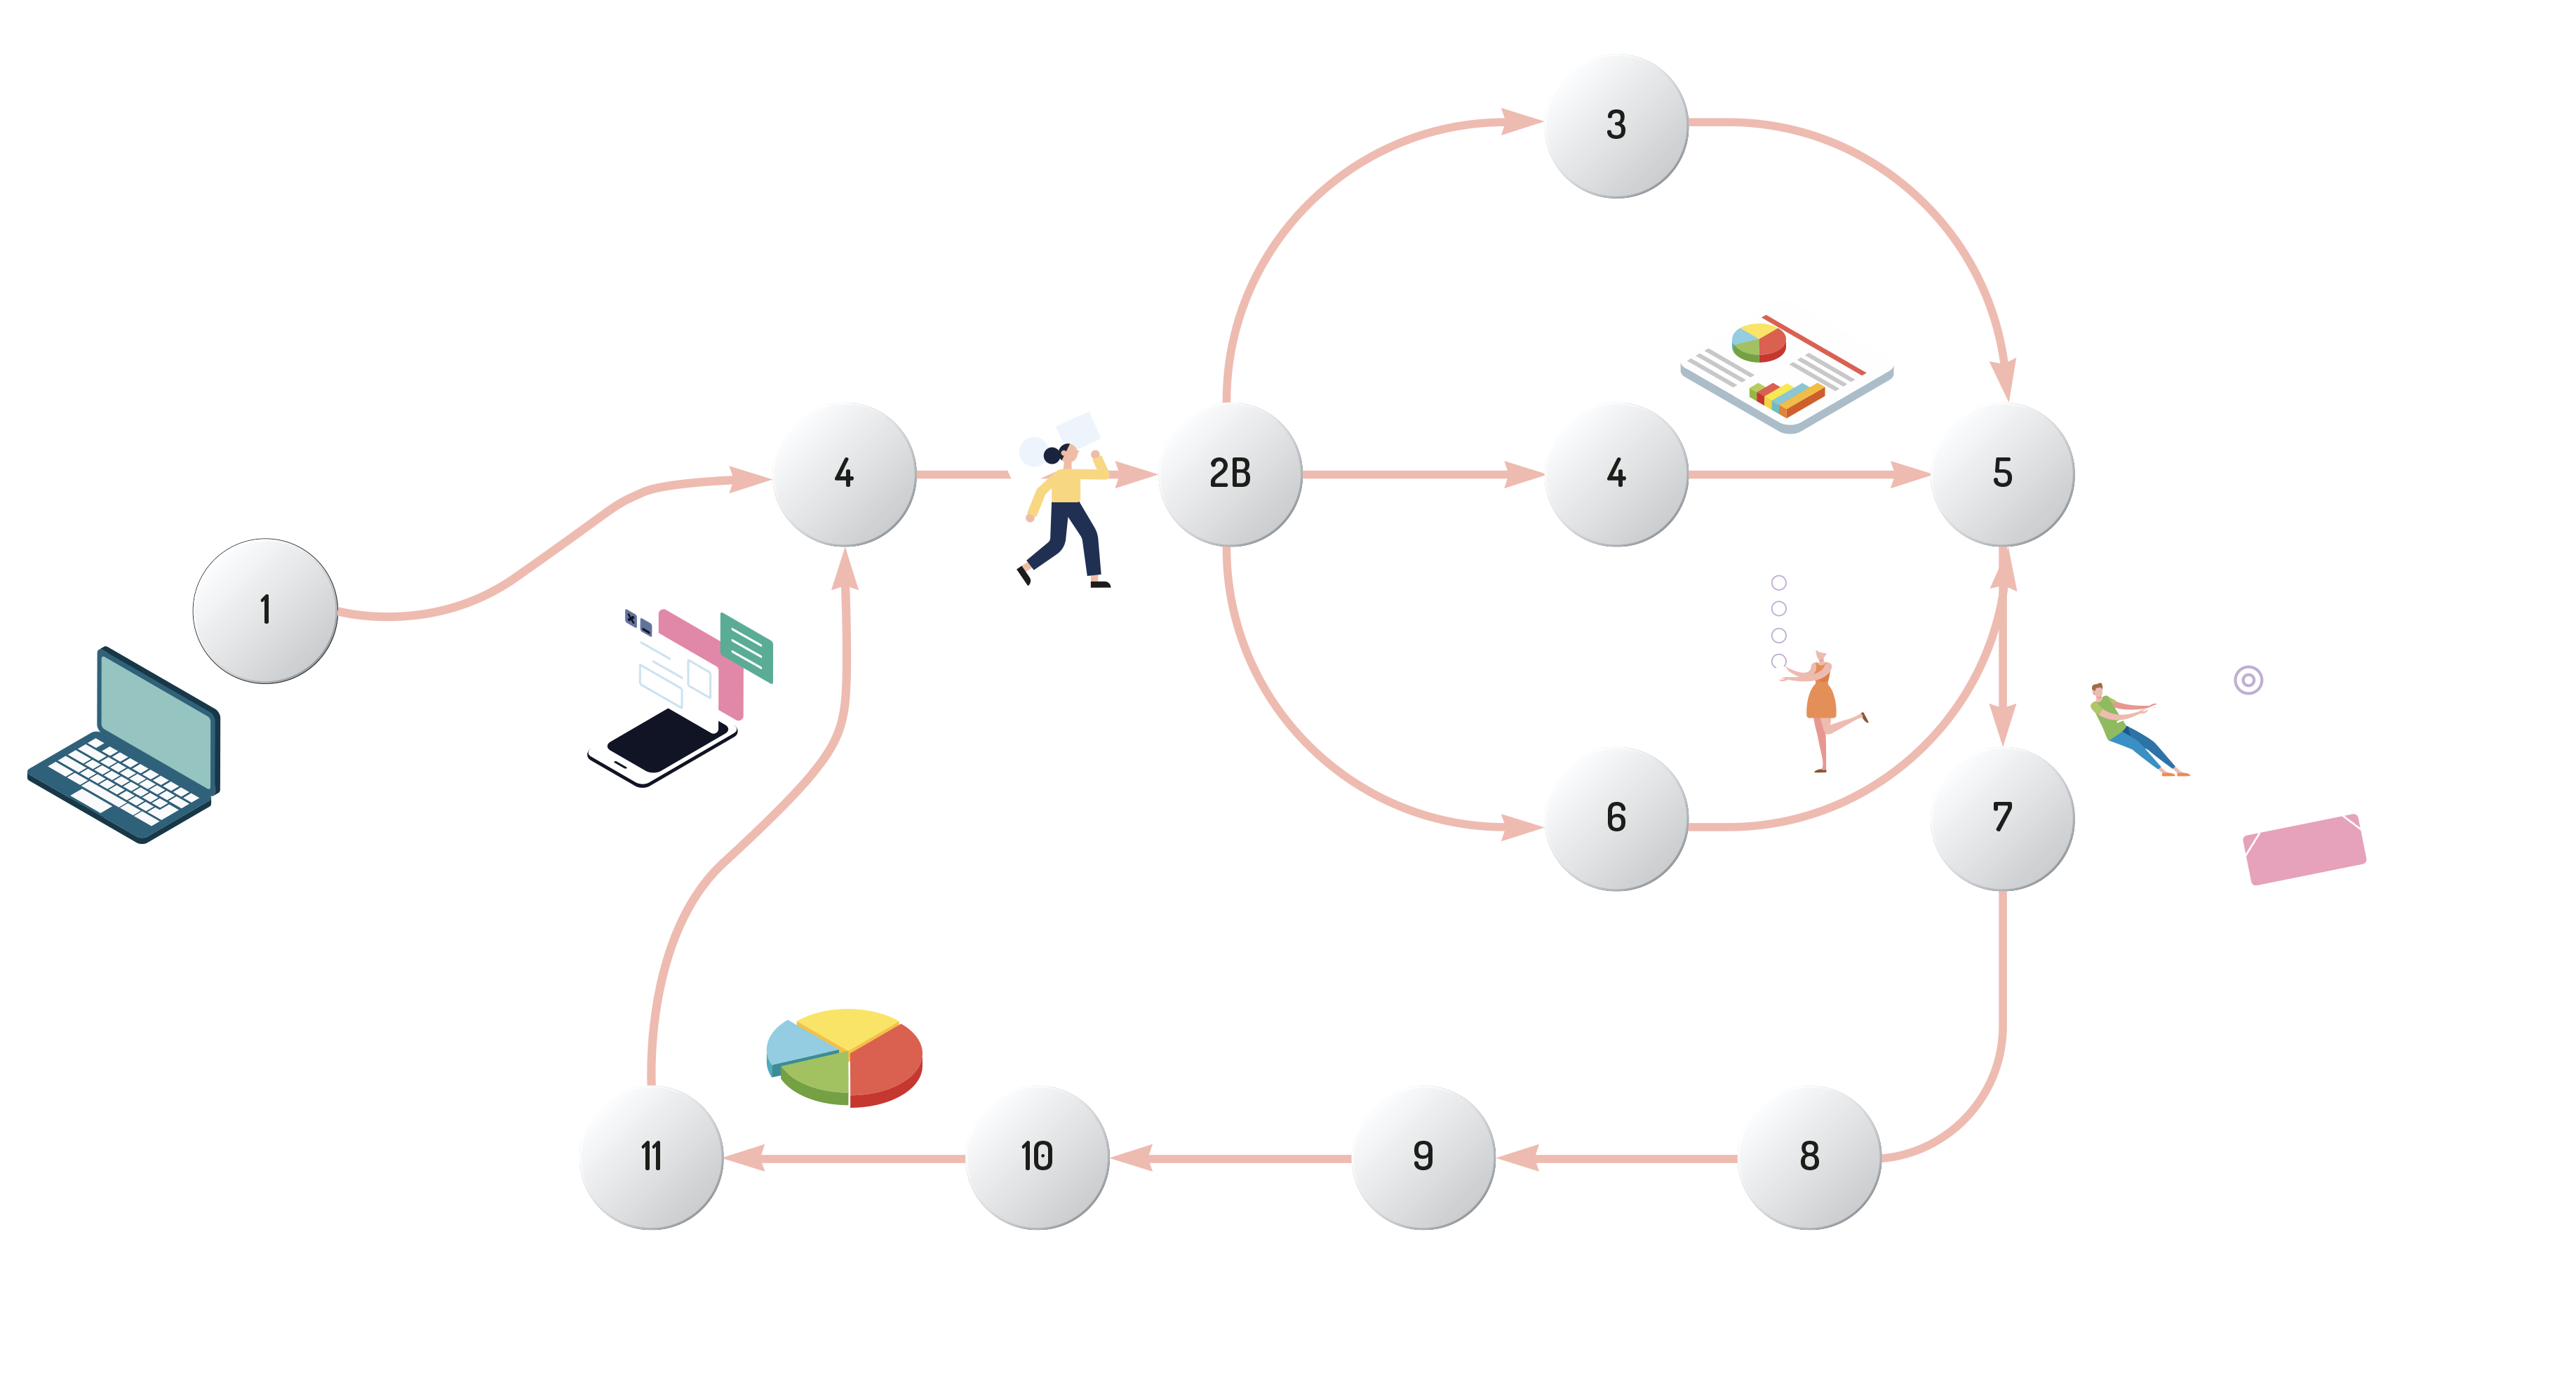 Customer State Diagram